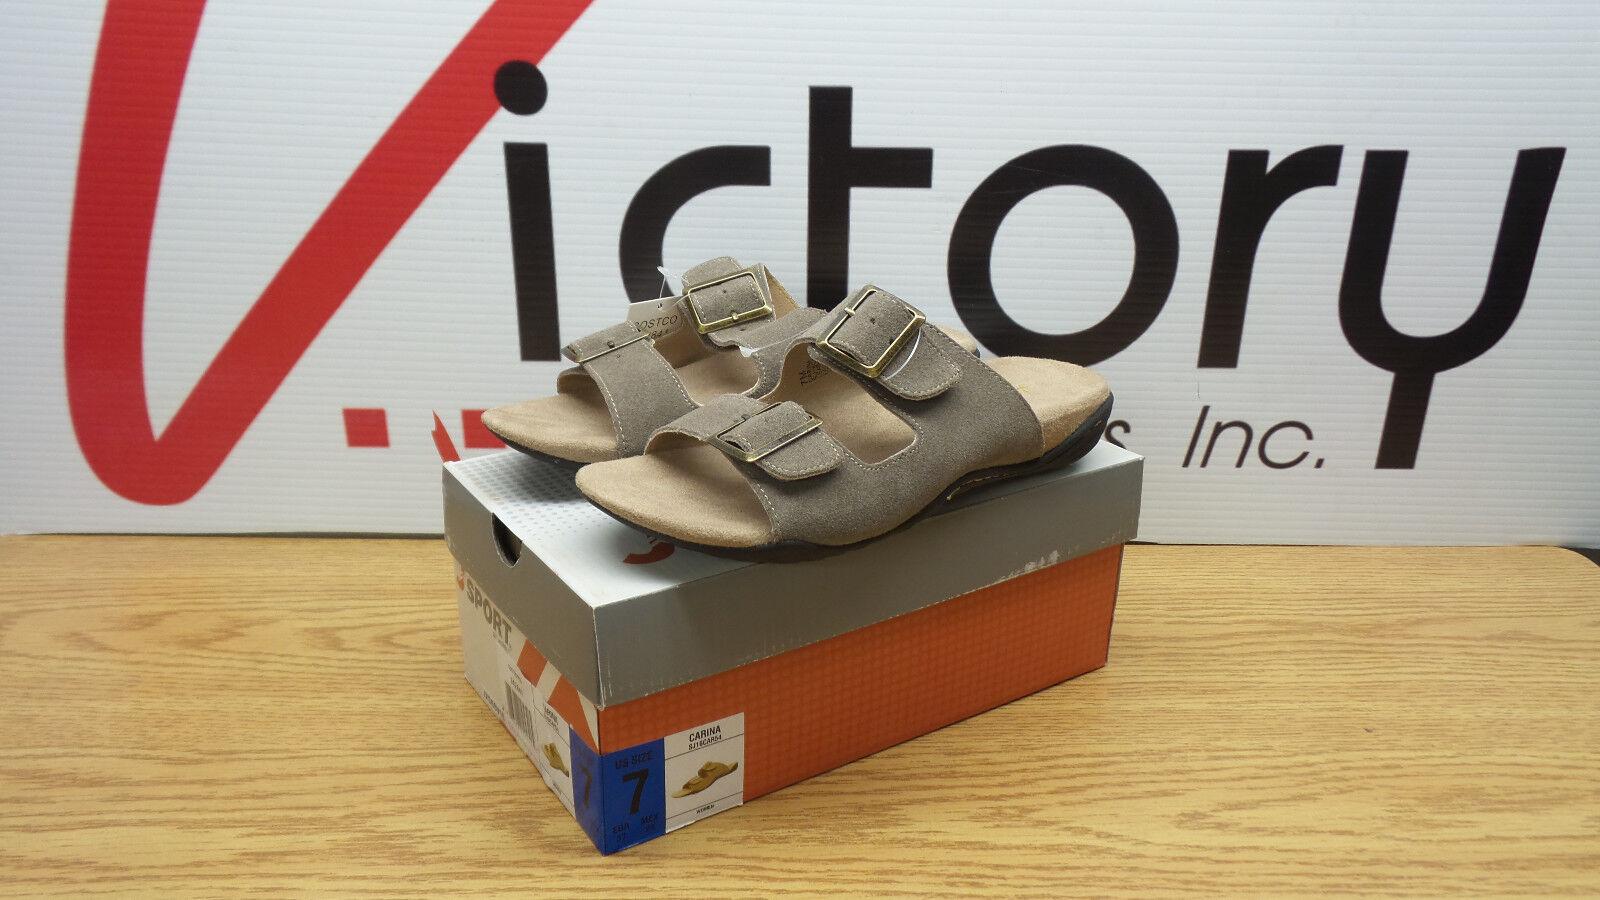 New JSport by Jambu Carina Tan Suede Slip-on Sandal 6 Sizes 7 8 9 10 Sizes 6 Buckle Shoe 7b885c